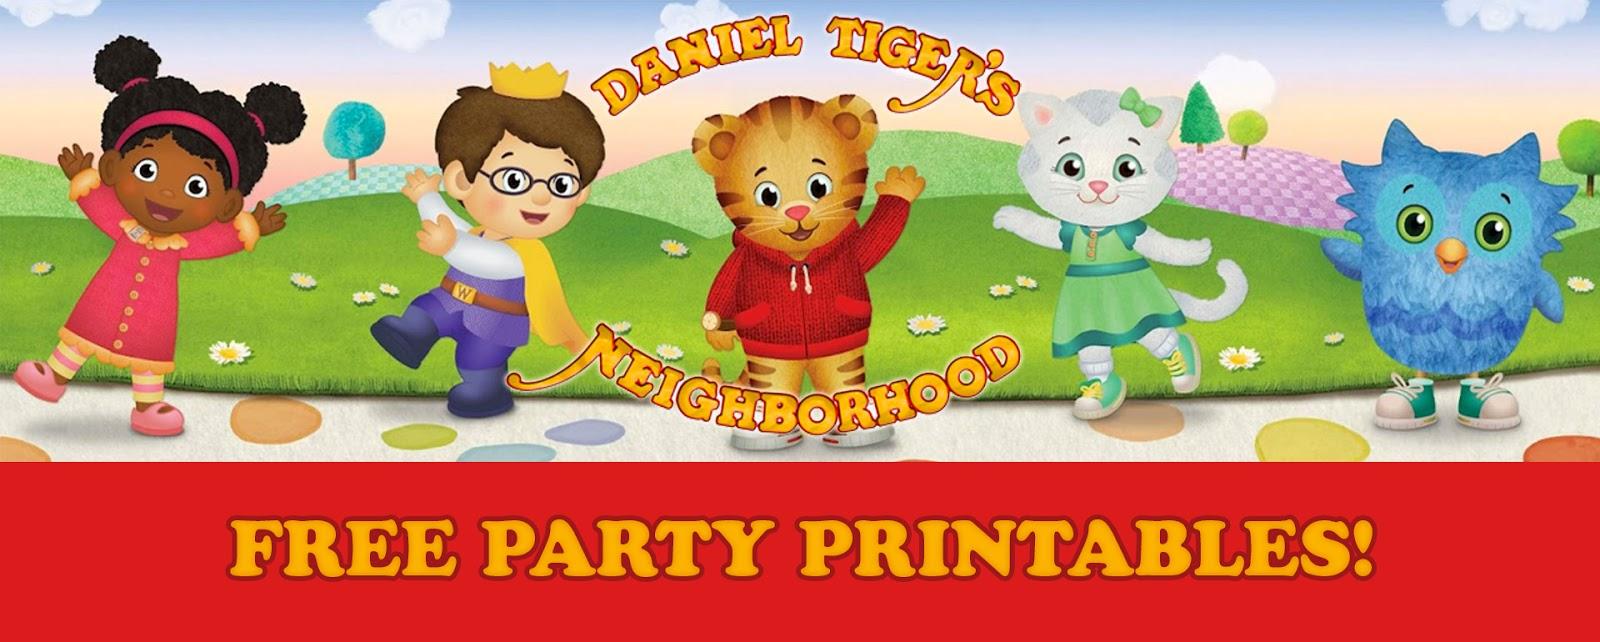 Luvibeekids Co Blog Daniel Tiger Birthday Party Printables Free Downloads